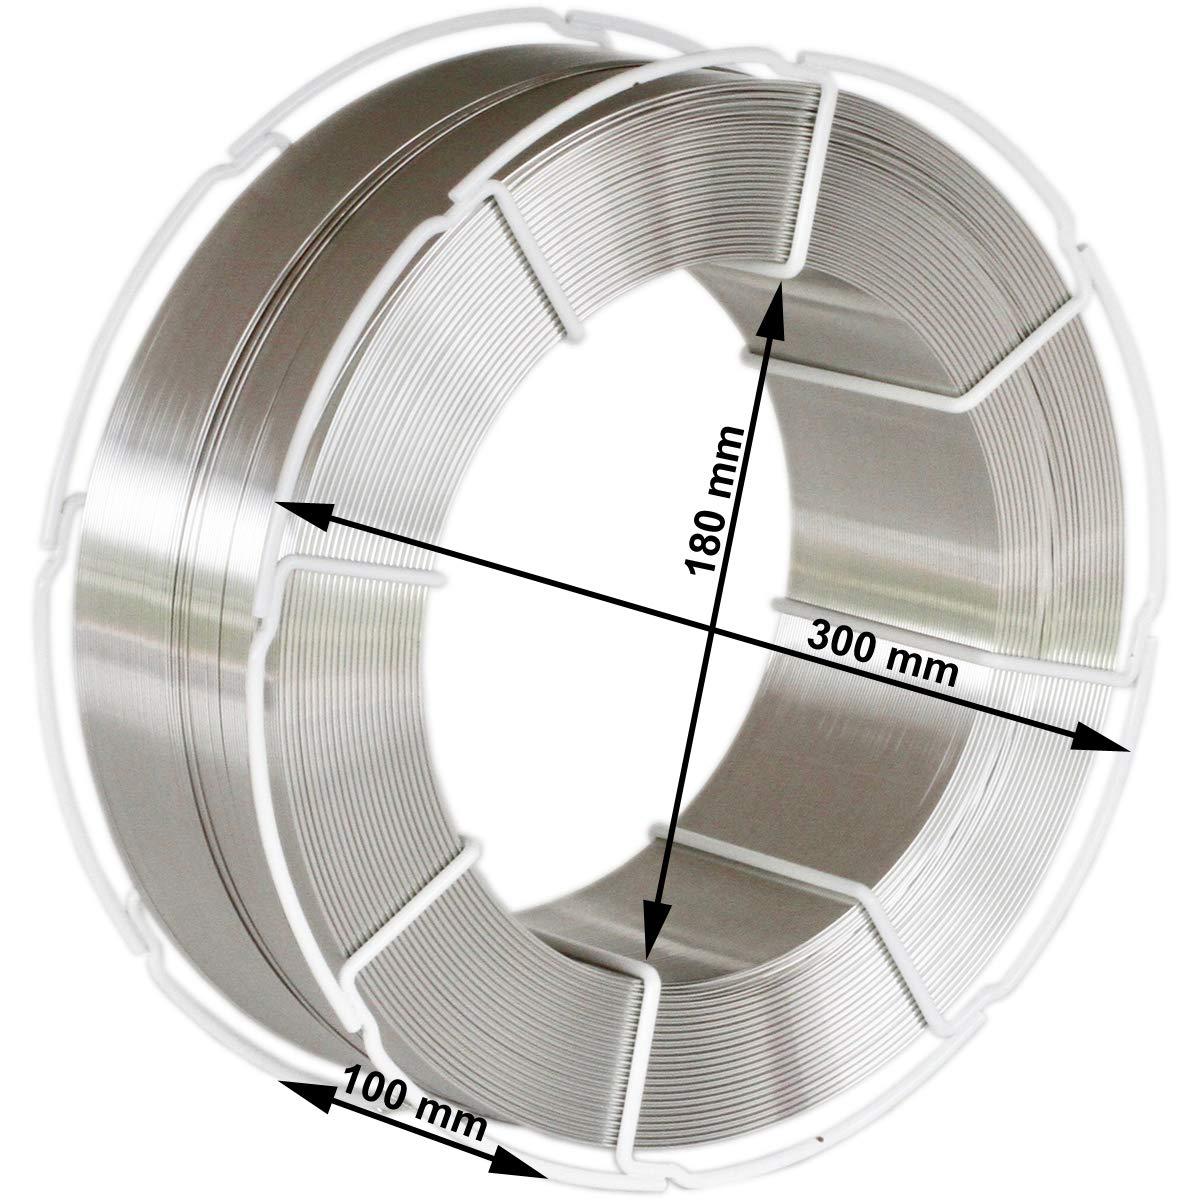 Aluminium Schweissdraht MIG, ML-5356, B-300, 7 kg (0,8) MIGAL.CO GmbH